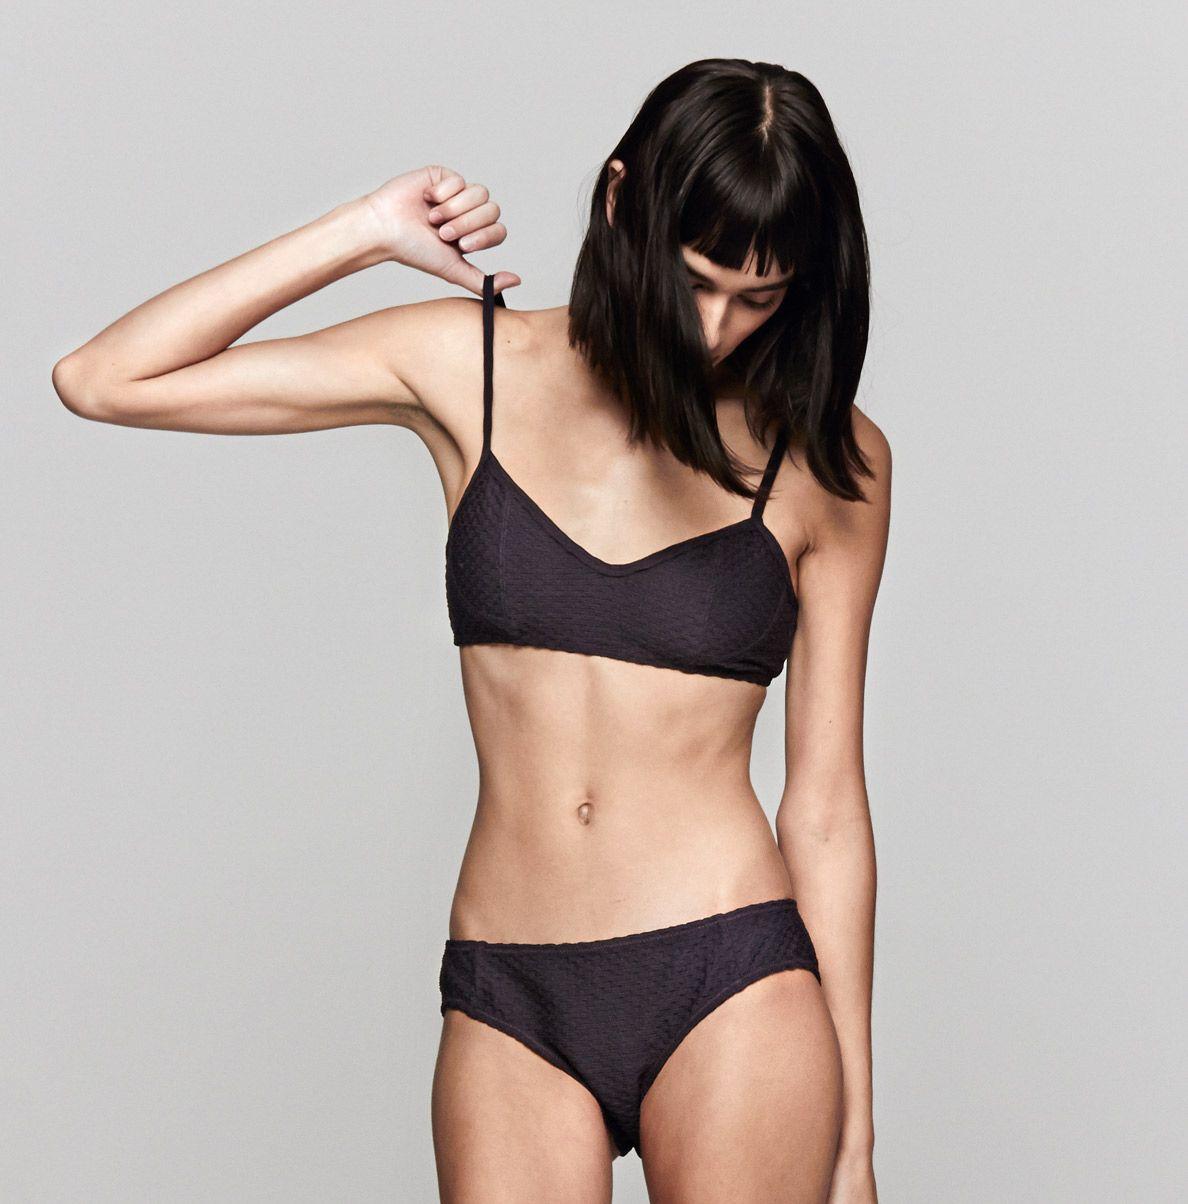 Bikini Margaux Brooke naked (25 photos), Sideboobs